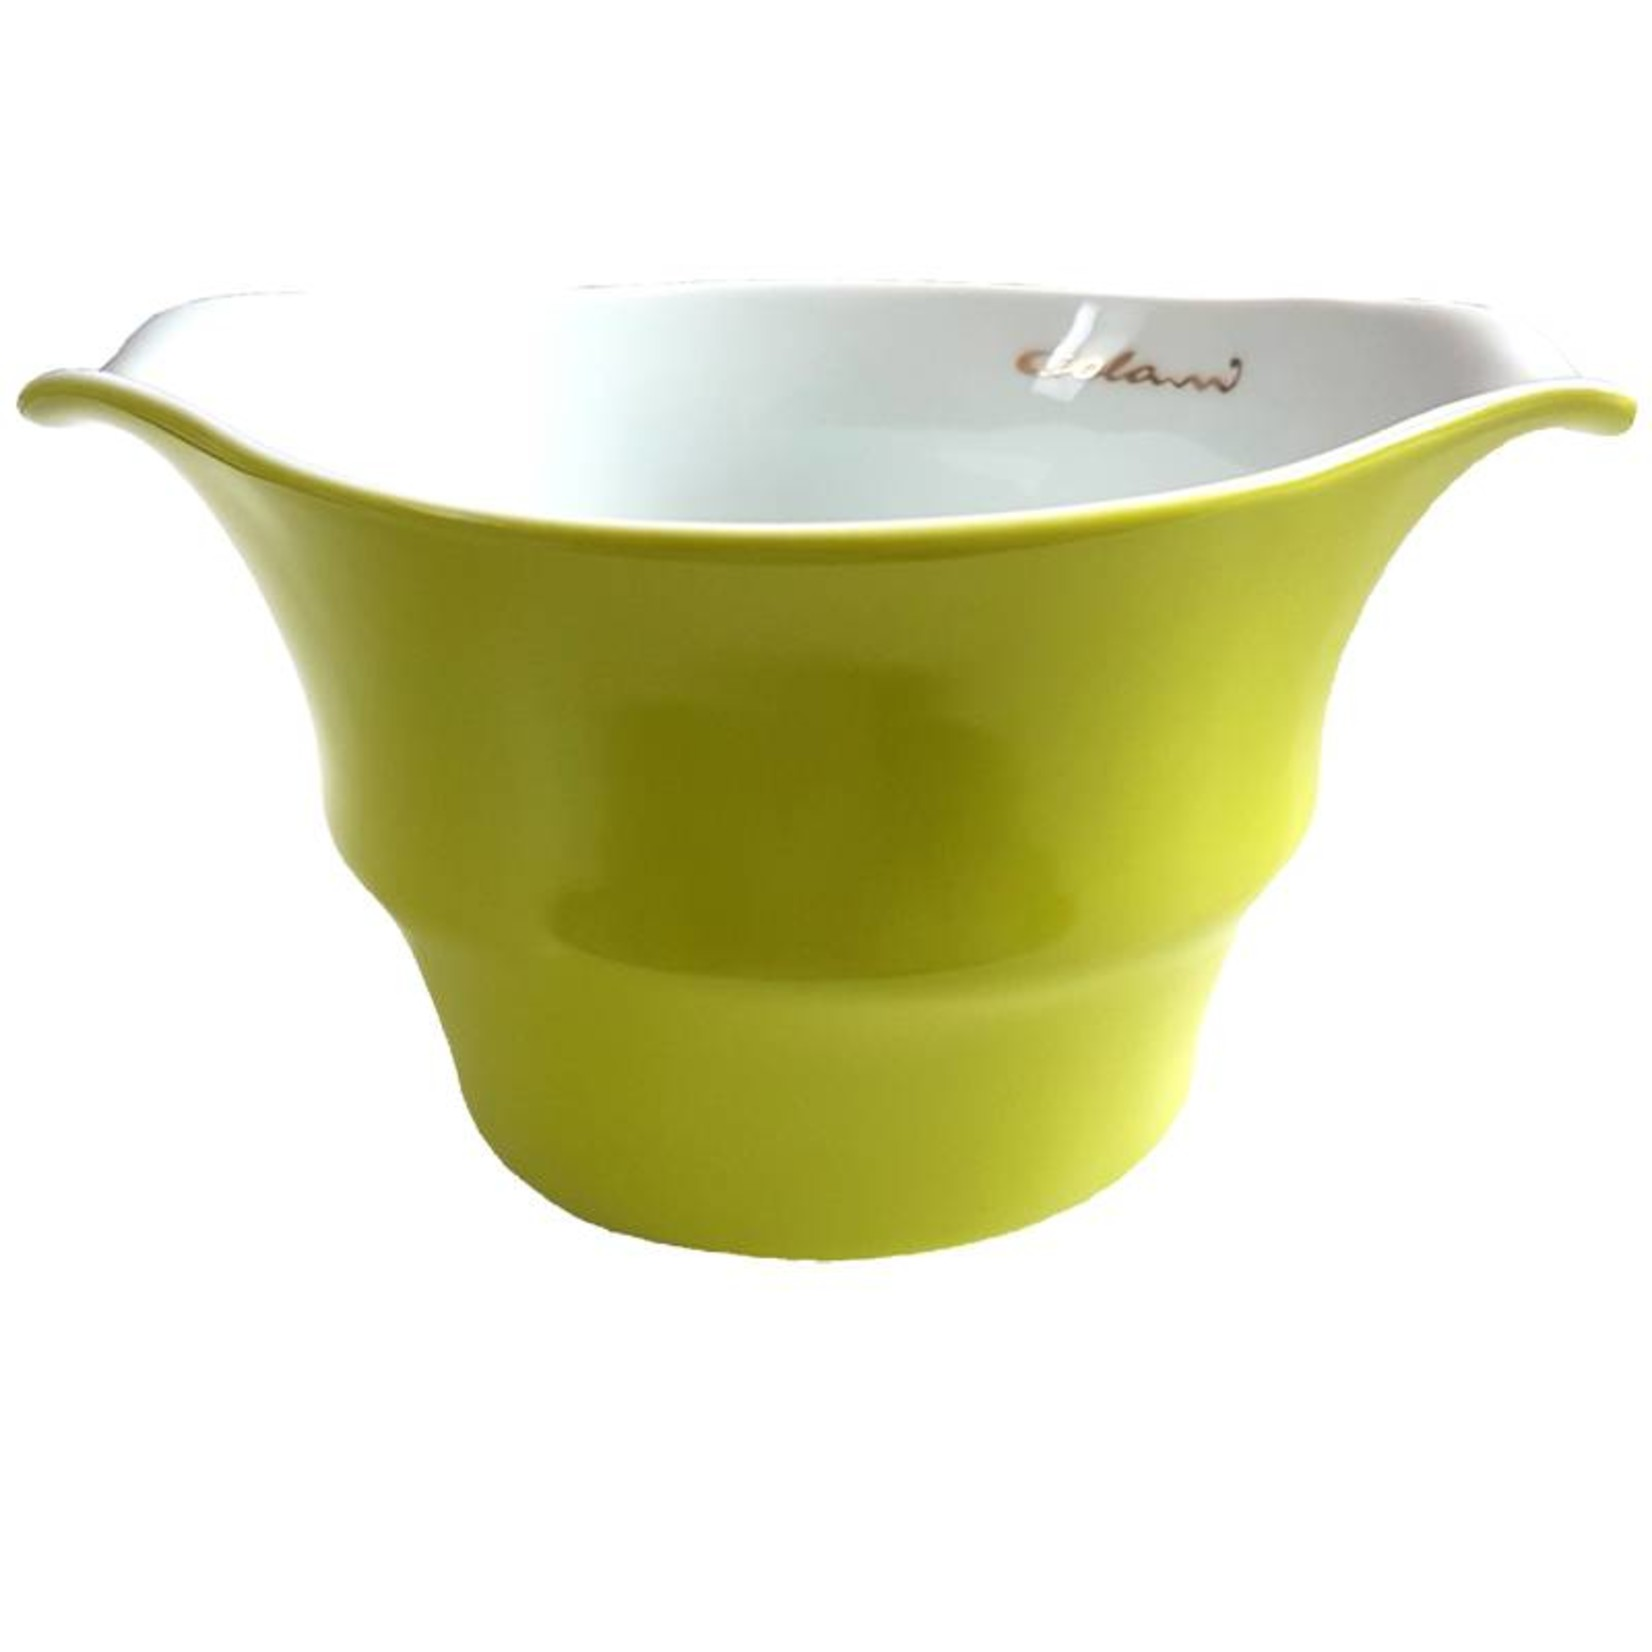 Colani Porzellanserie Colani Müslischale I grün I Schüssel I Porzellan